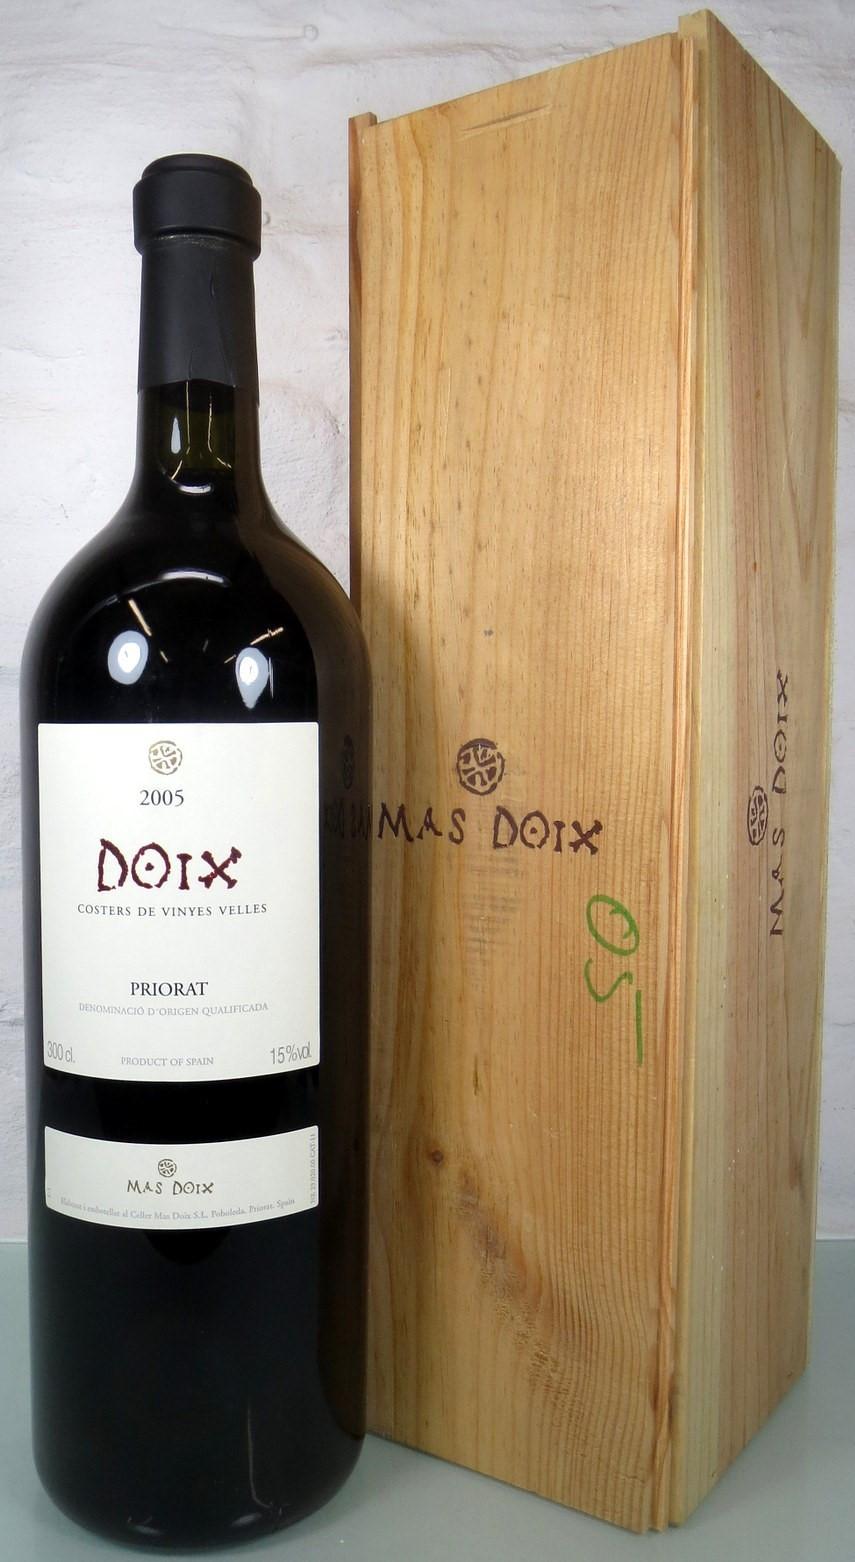 Mas Doix »Doix« Costers de Vinyes Velles 2005 (3,0 L)